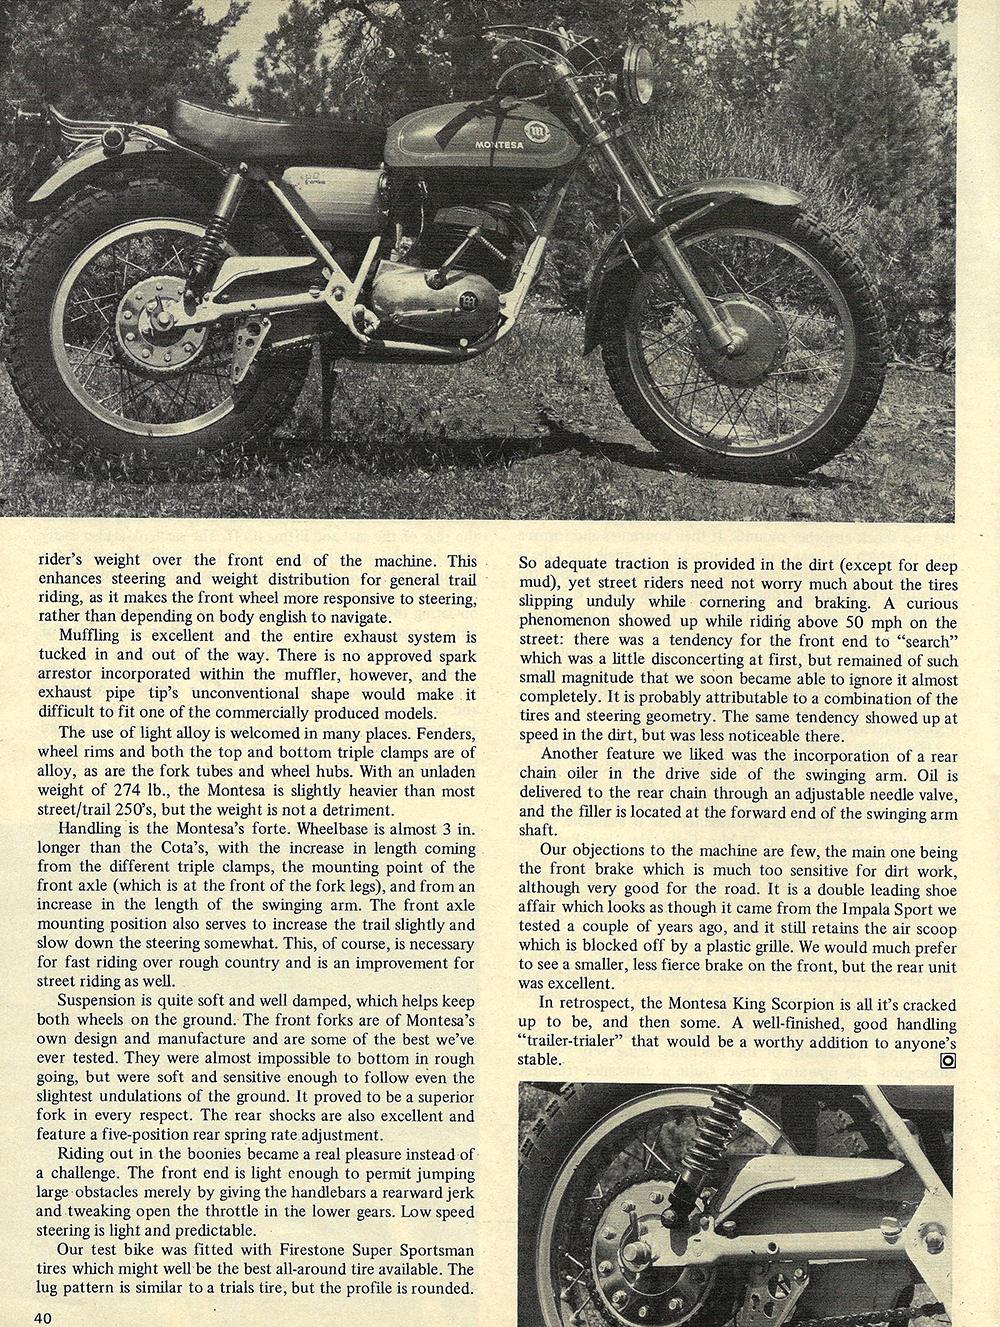 1970 Montesa King Scorpion road test 03.jpg